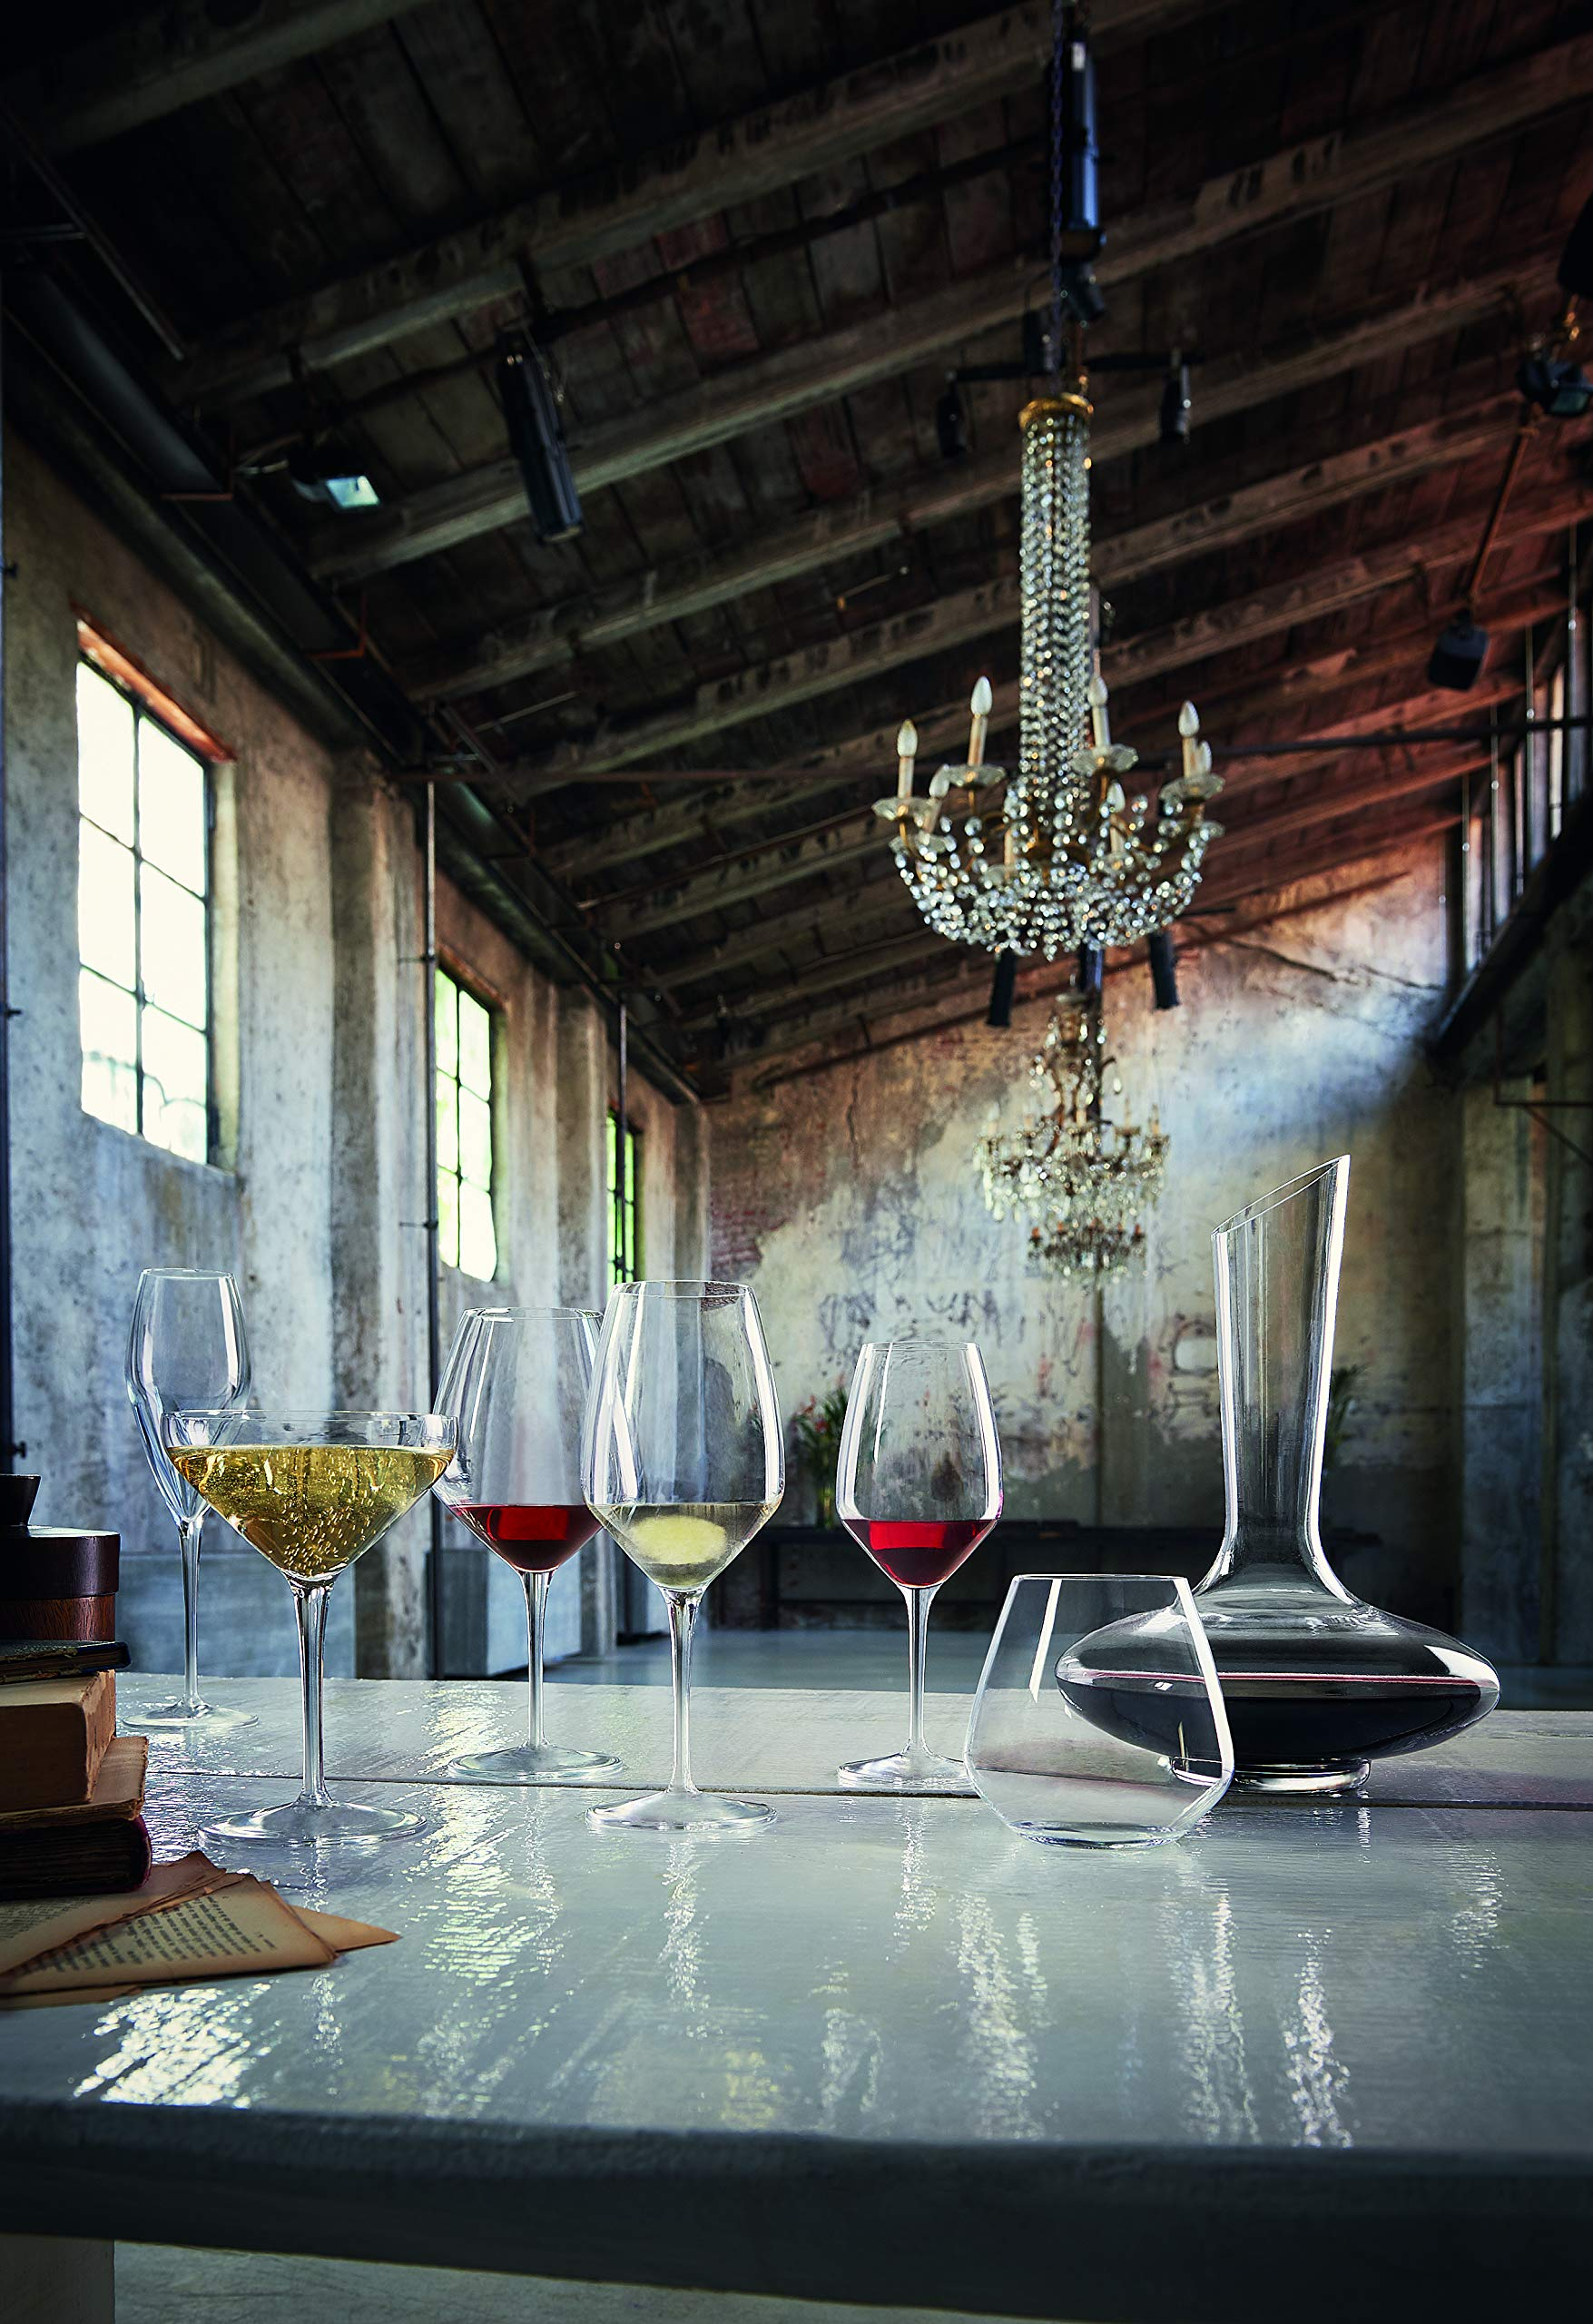 Luigi Bormioli Atelier Sauvignon Wine Glass, 11-3/4-Ounce, Set of 6 by Luigi Bormioli (Image #3)